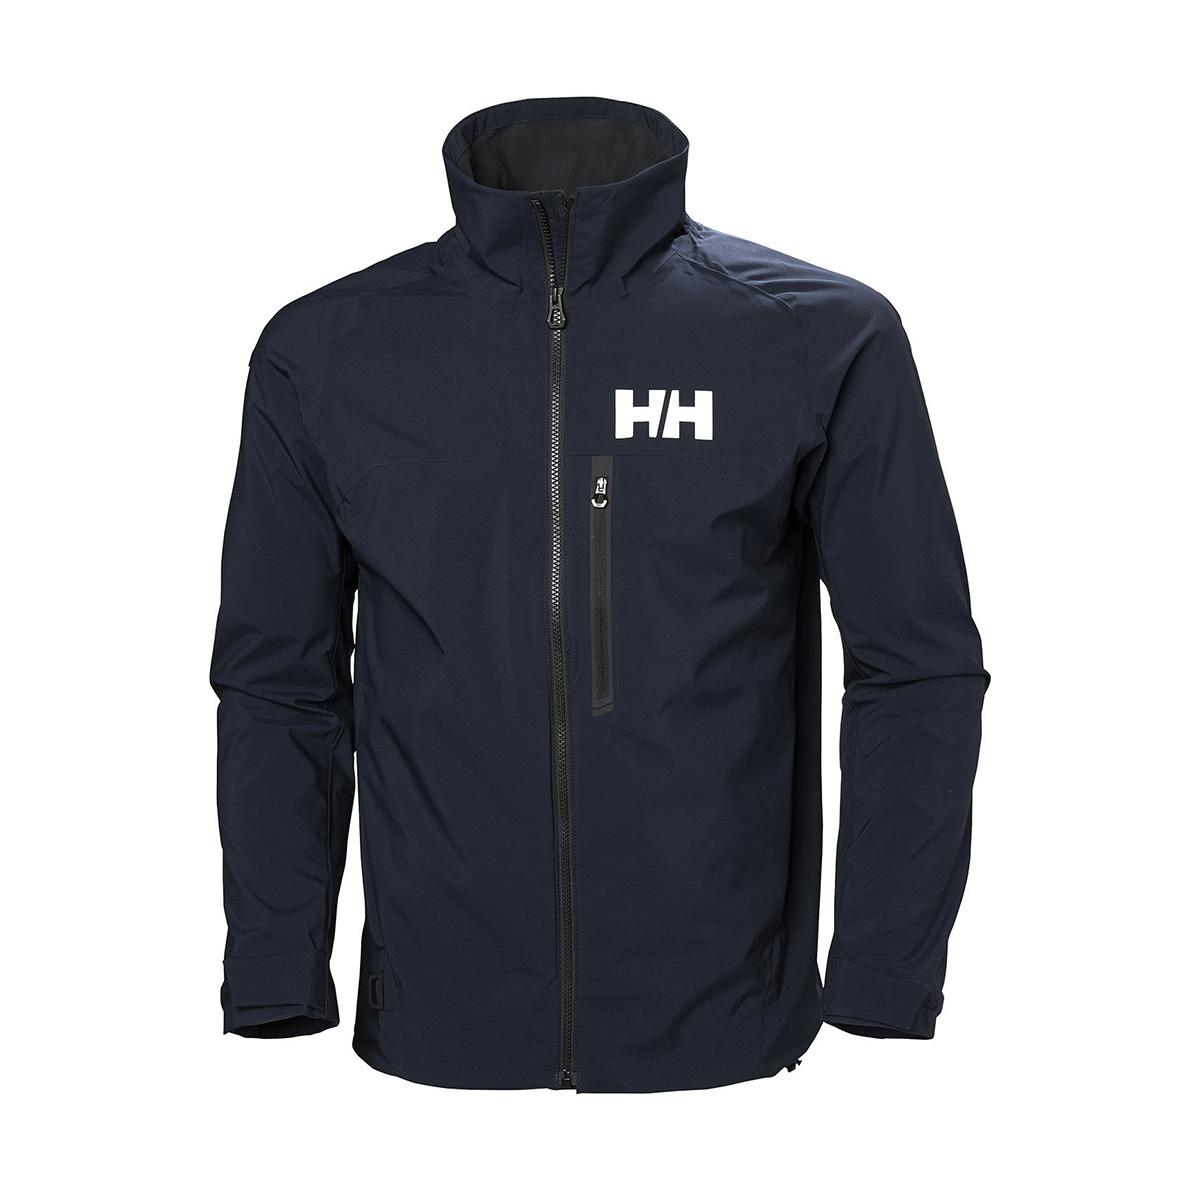 Helly Hanse HP Racing Jacket (34040)